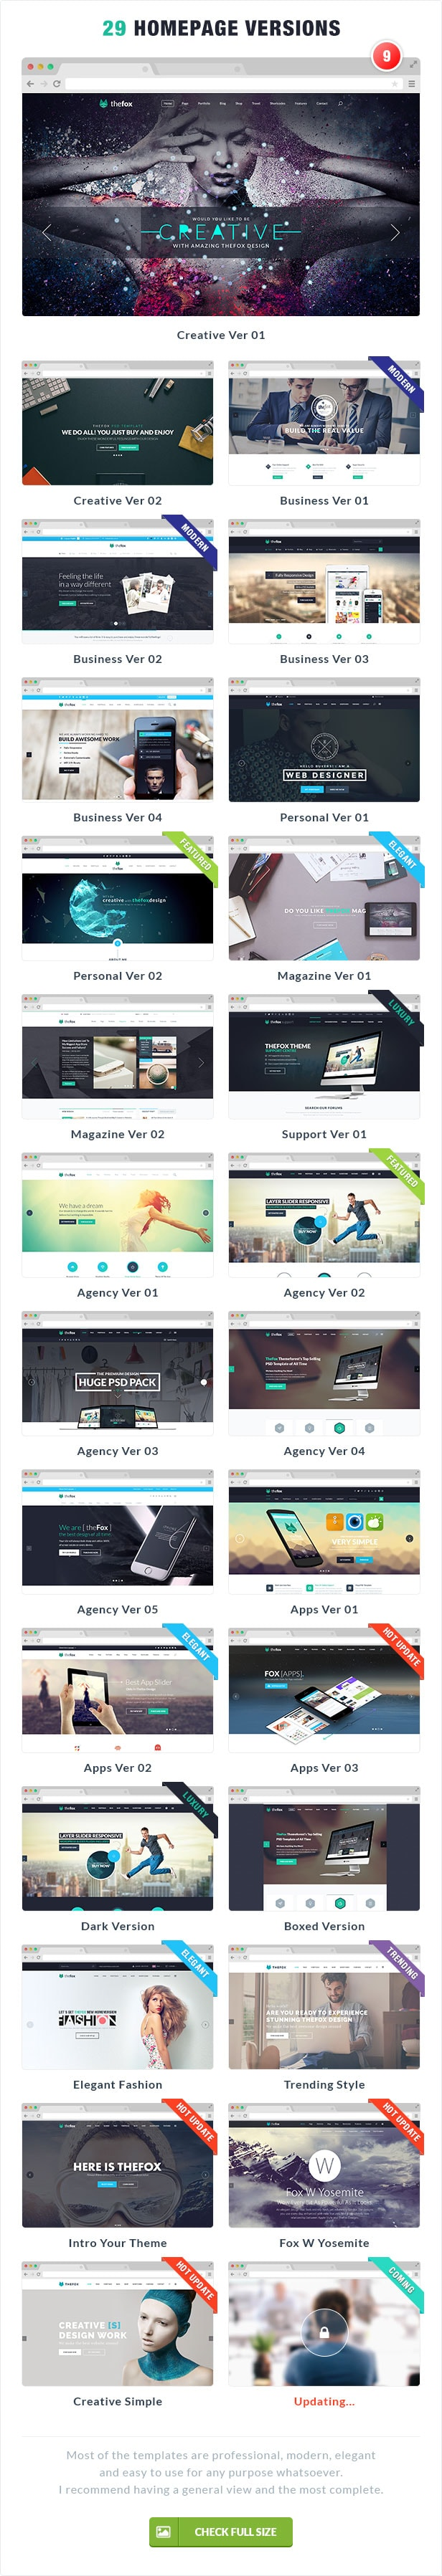 08 thefox psd home page design - TheFox | Multi-Purpose PSD Template